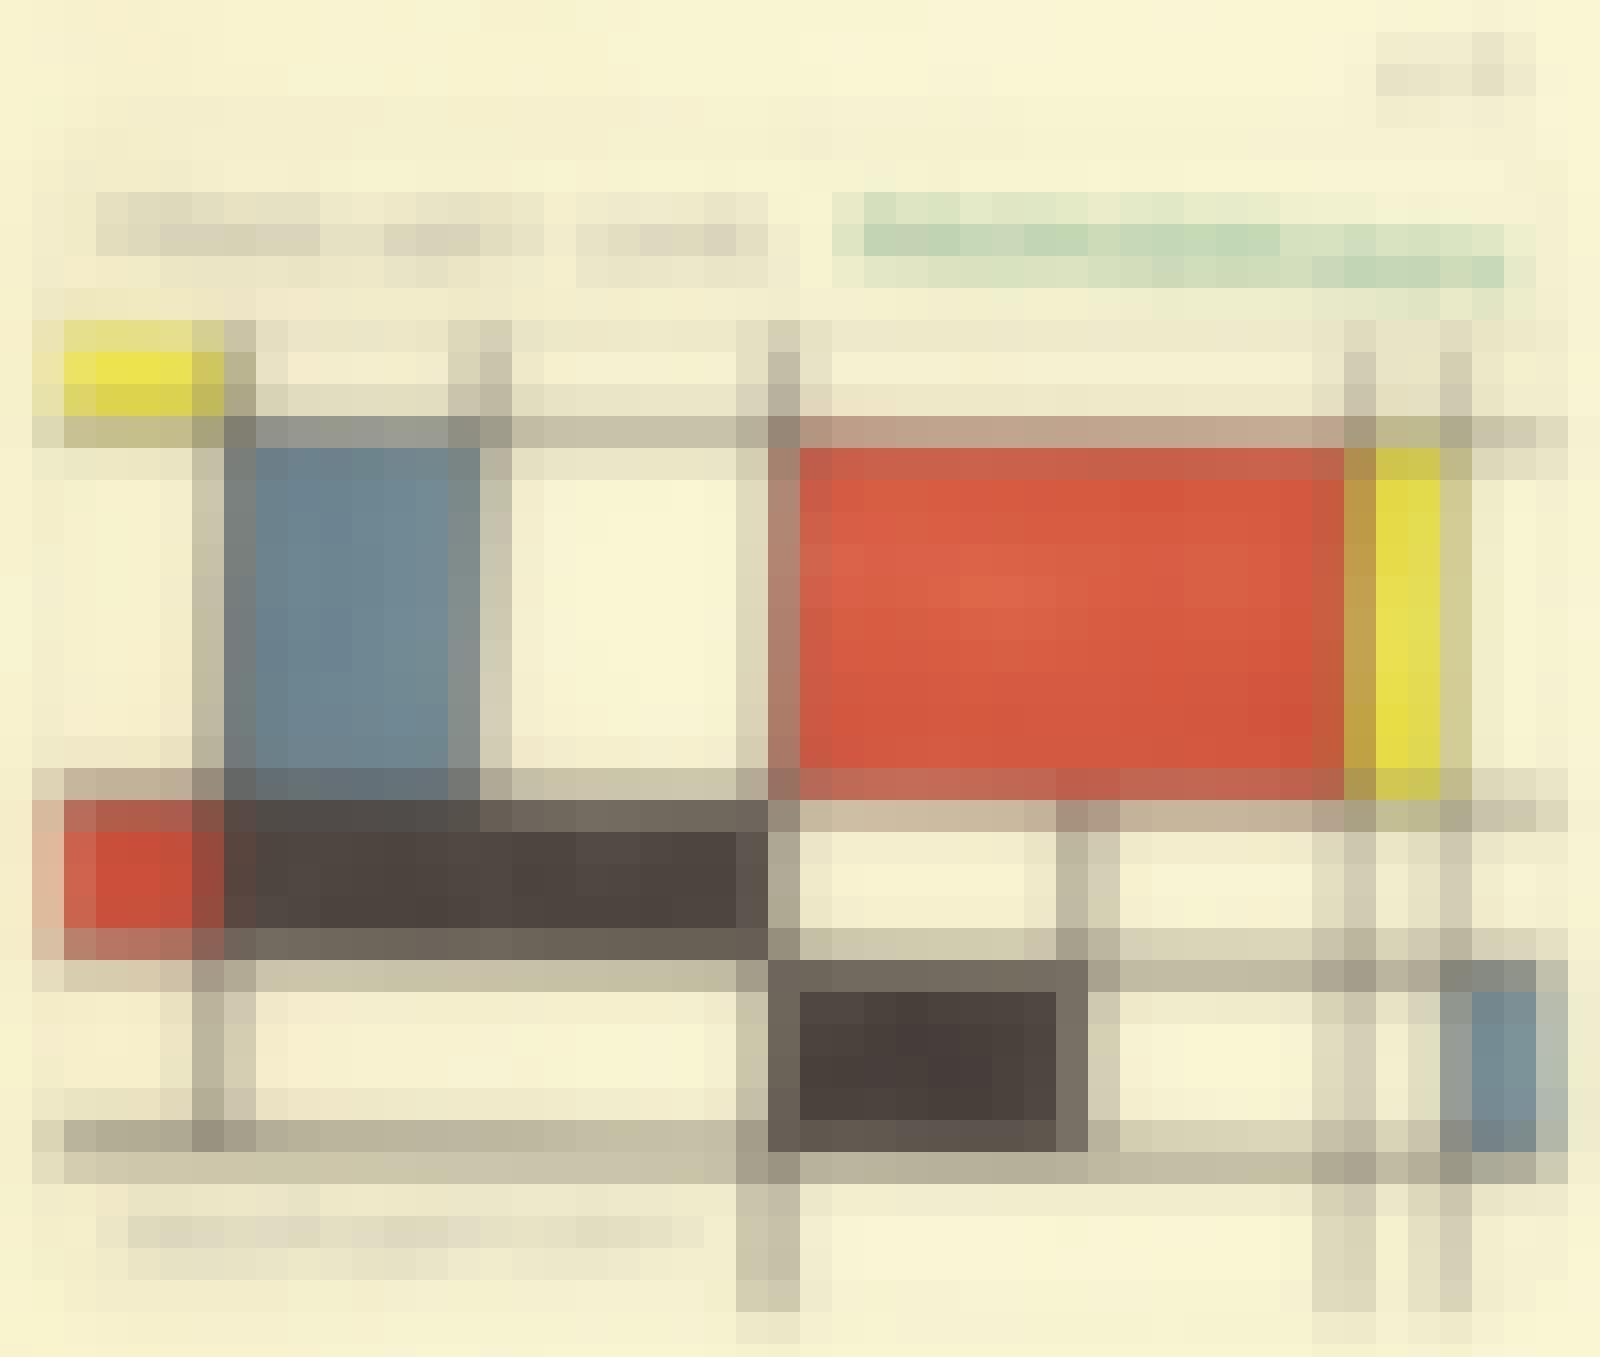 Make art like Mondrian - Sketchplanations